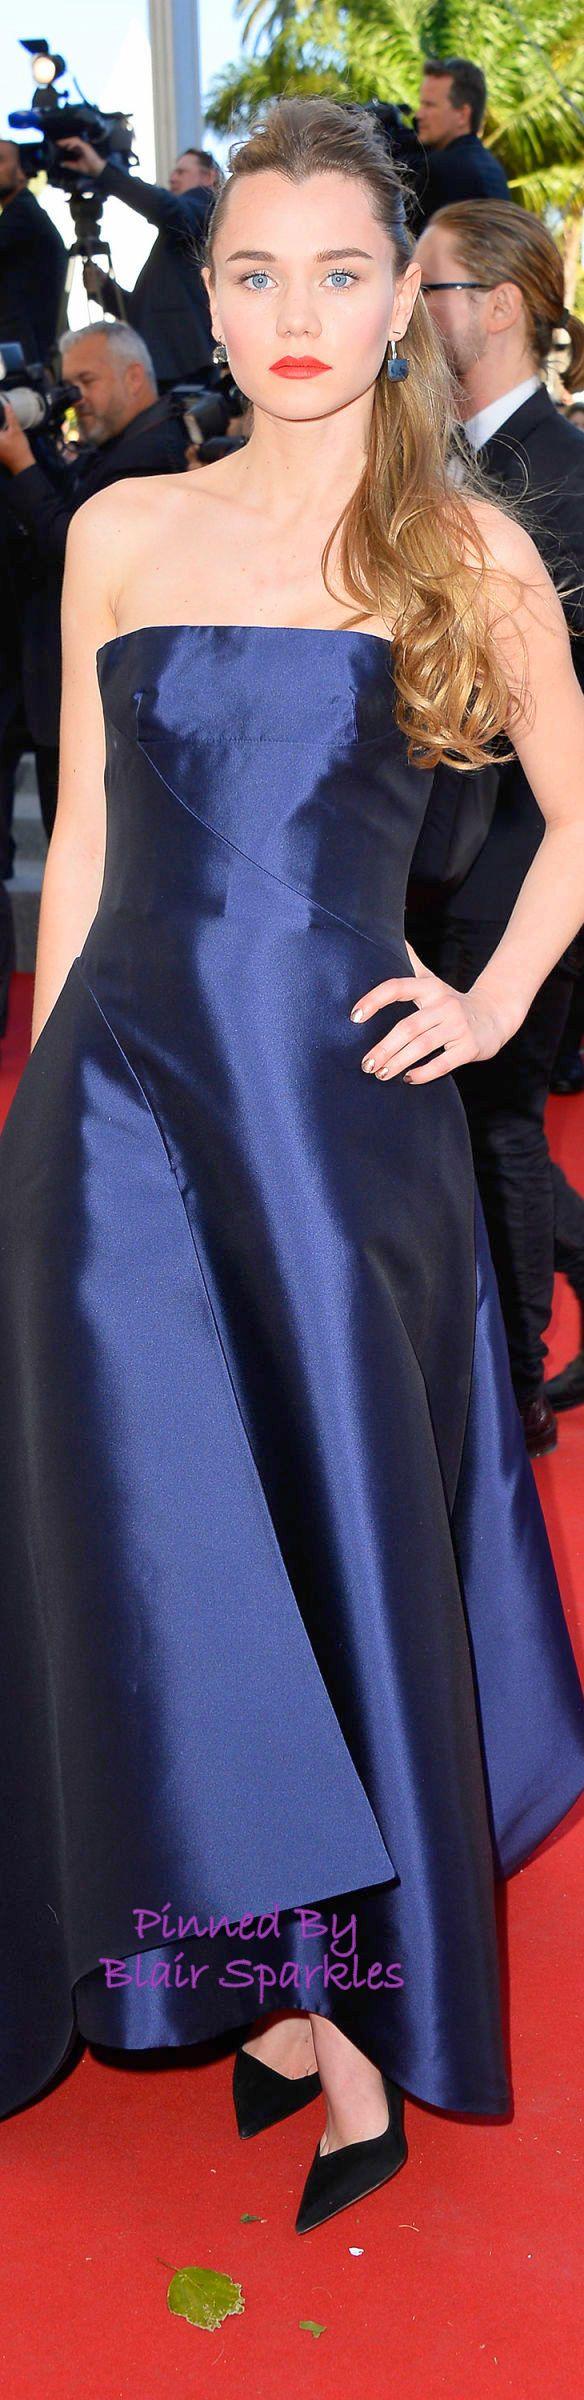 Imogen Waterhouse in Dior CANNES 2015 Red Carpet | ♕♚εїз BLAIR SPARKLES